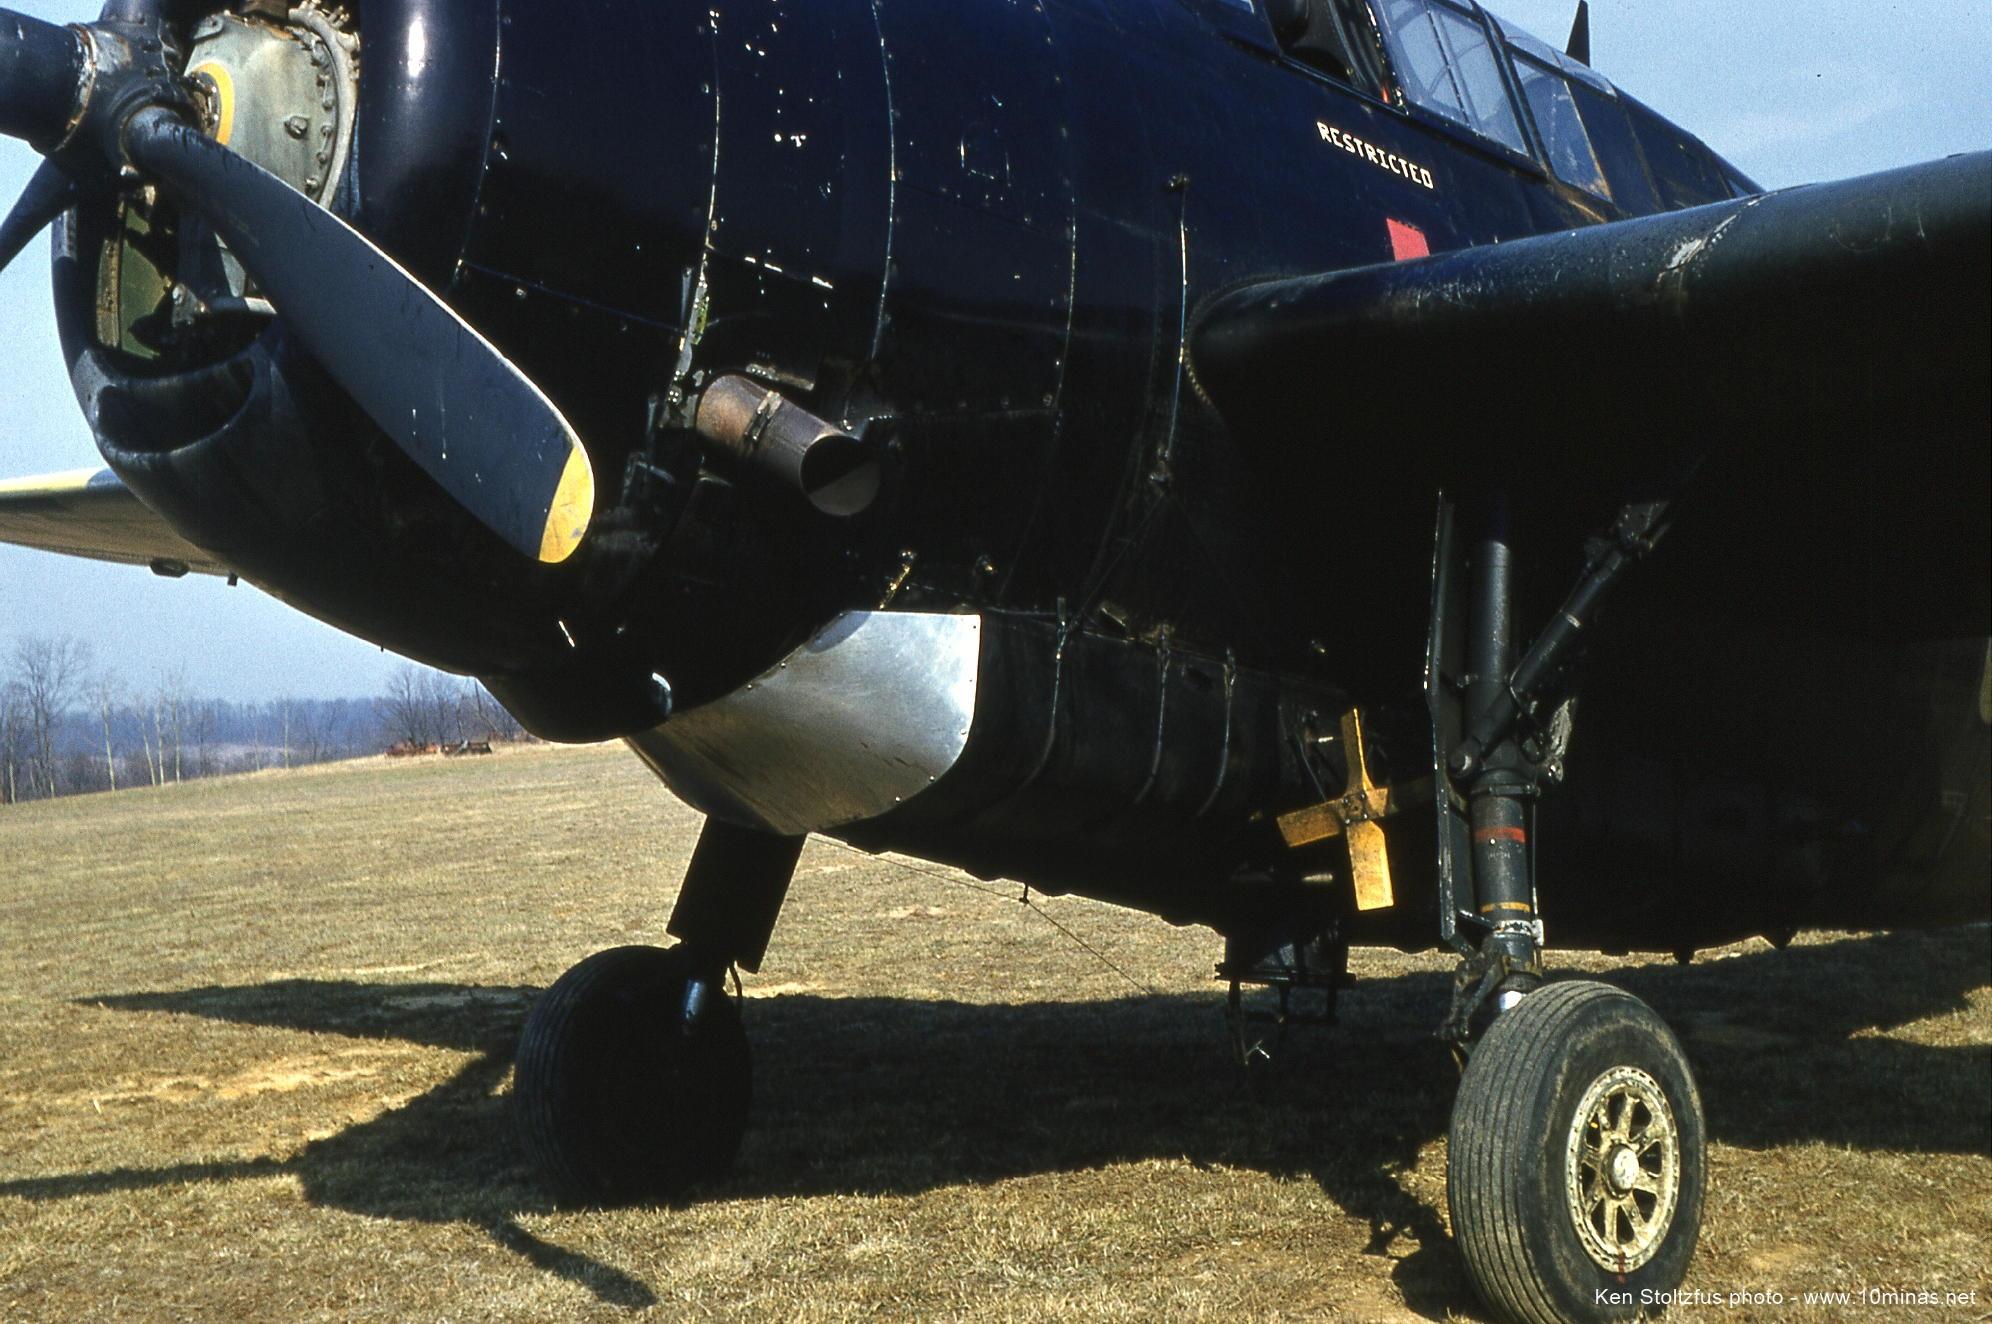 Grumman_TBM_Avenger_Airplane_picture